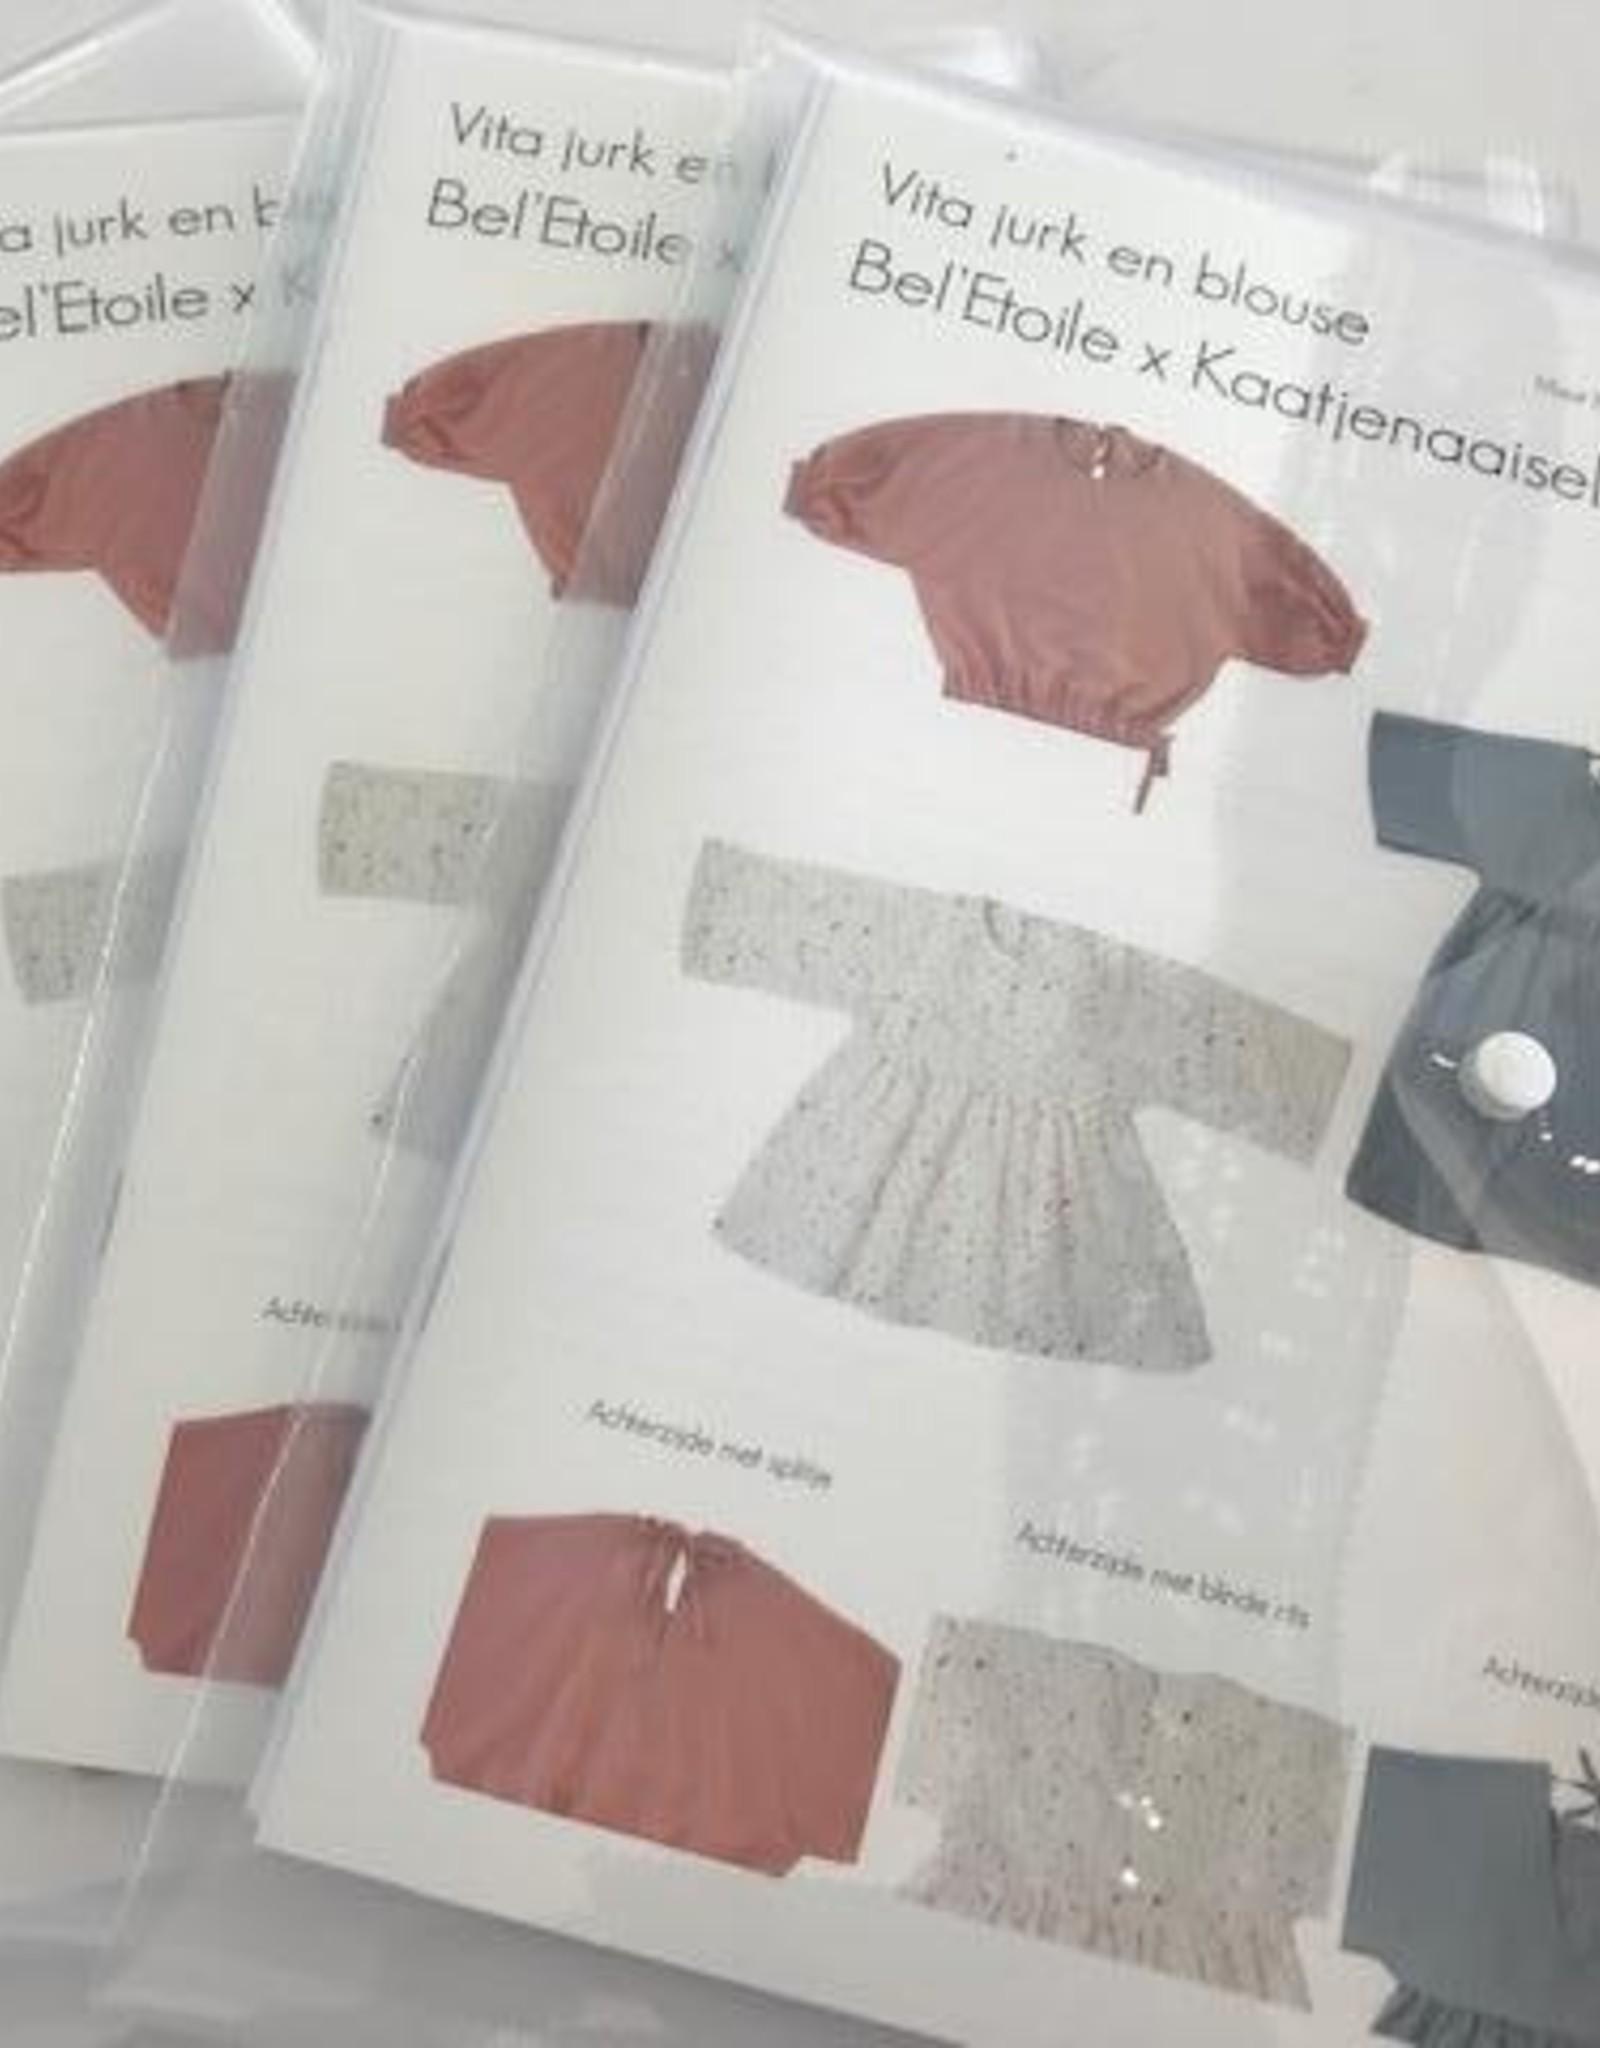 Bel'Etoile Vita jurk en blouse kids